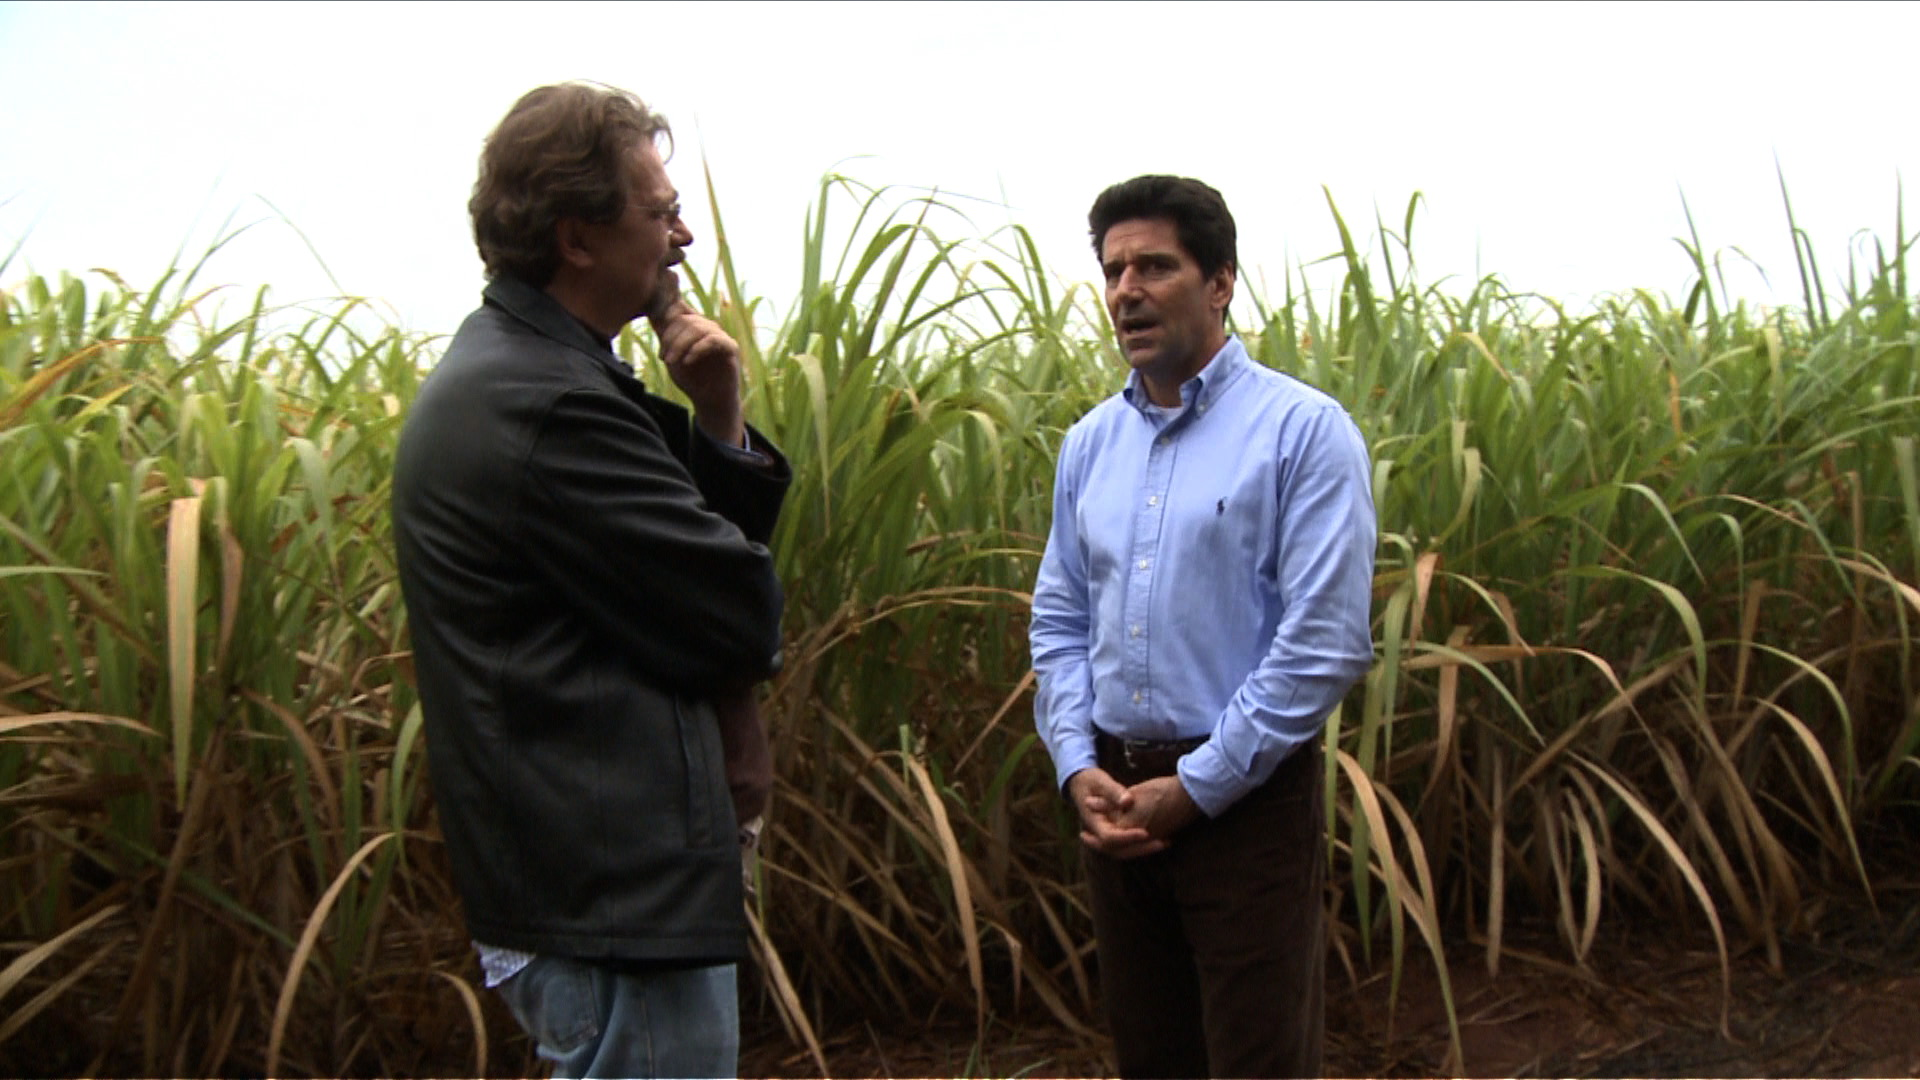 Leontino Balbo: Listening to Nature Sustainablizes Big Agriculture